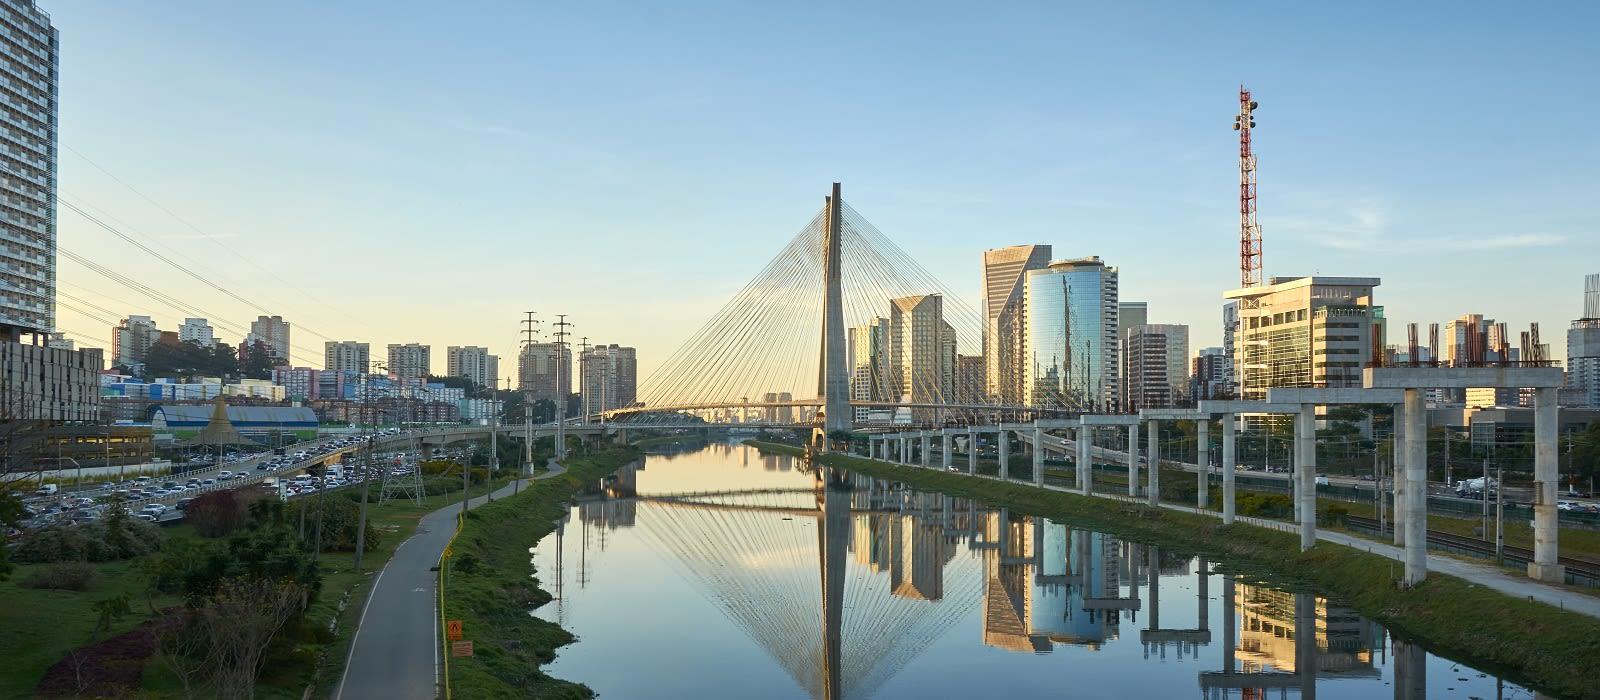 Brazil's Big Cities, Nature and Beach Tour Trip 6